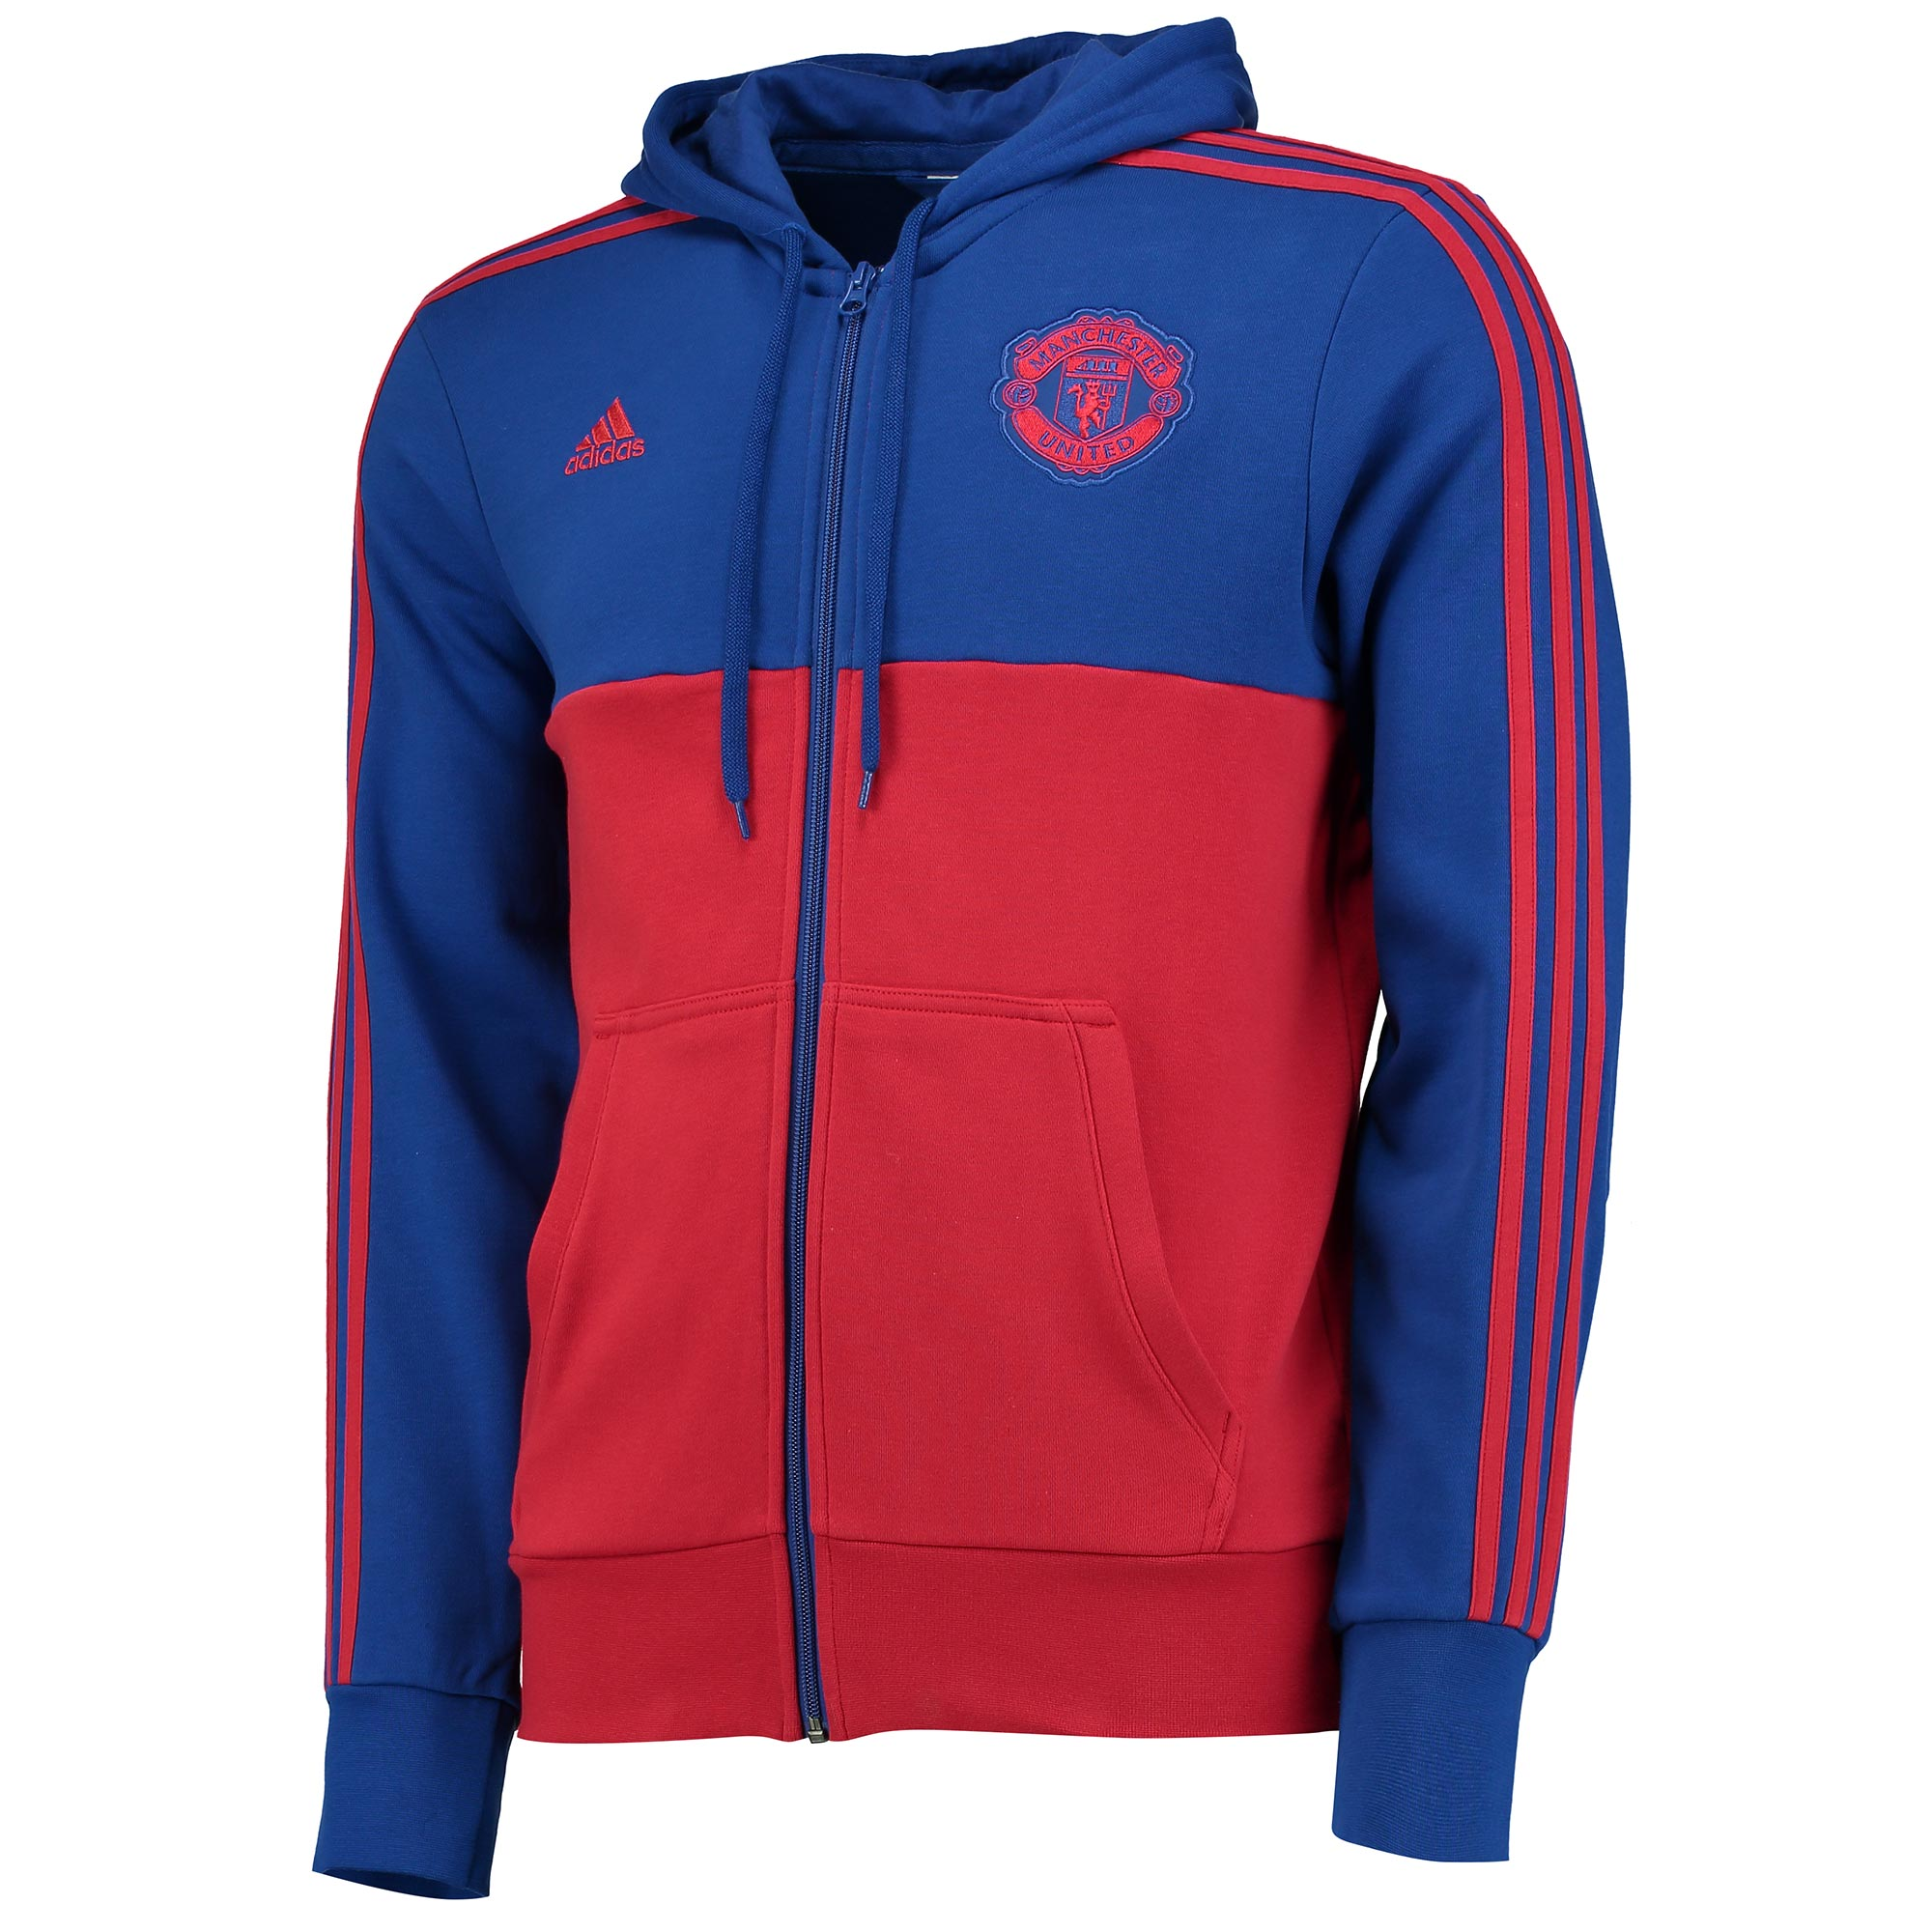 Manchester United 3 Stripe Full Zip Hoodie - Royal Blue